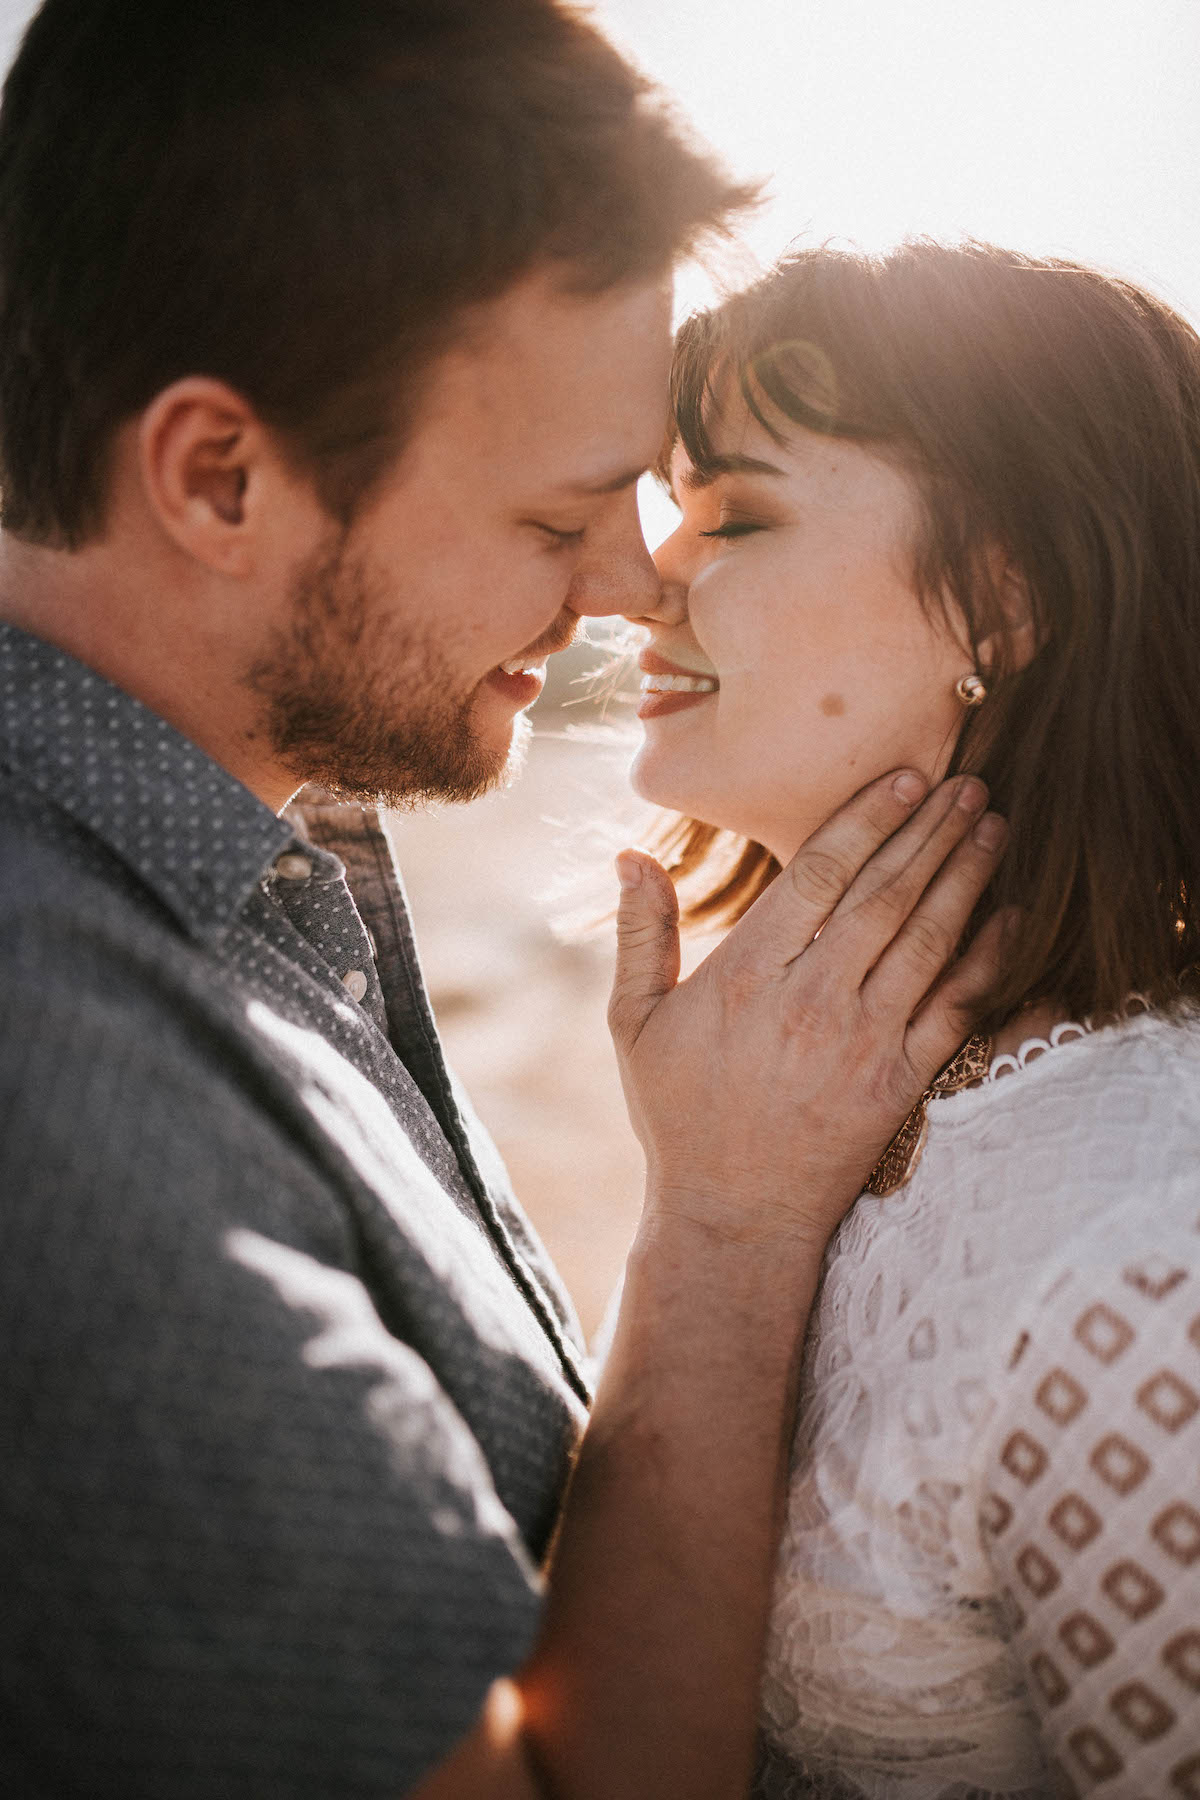 couple kissing photo ideas for outside photoshoot